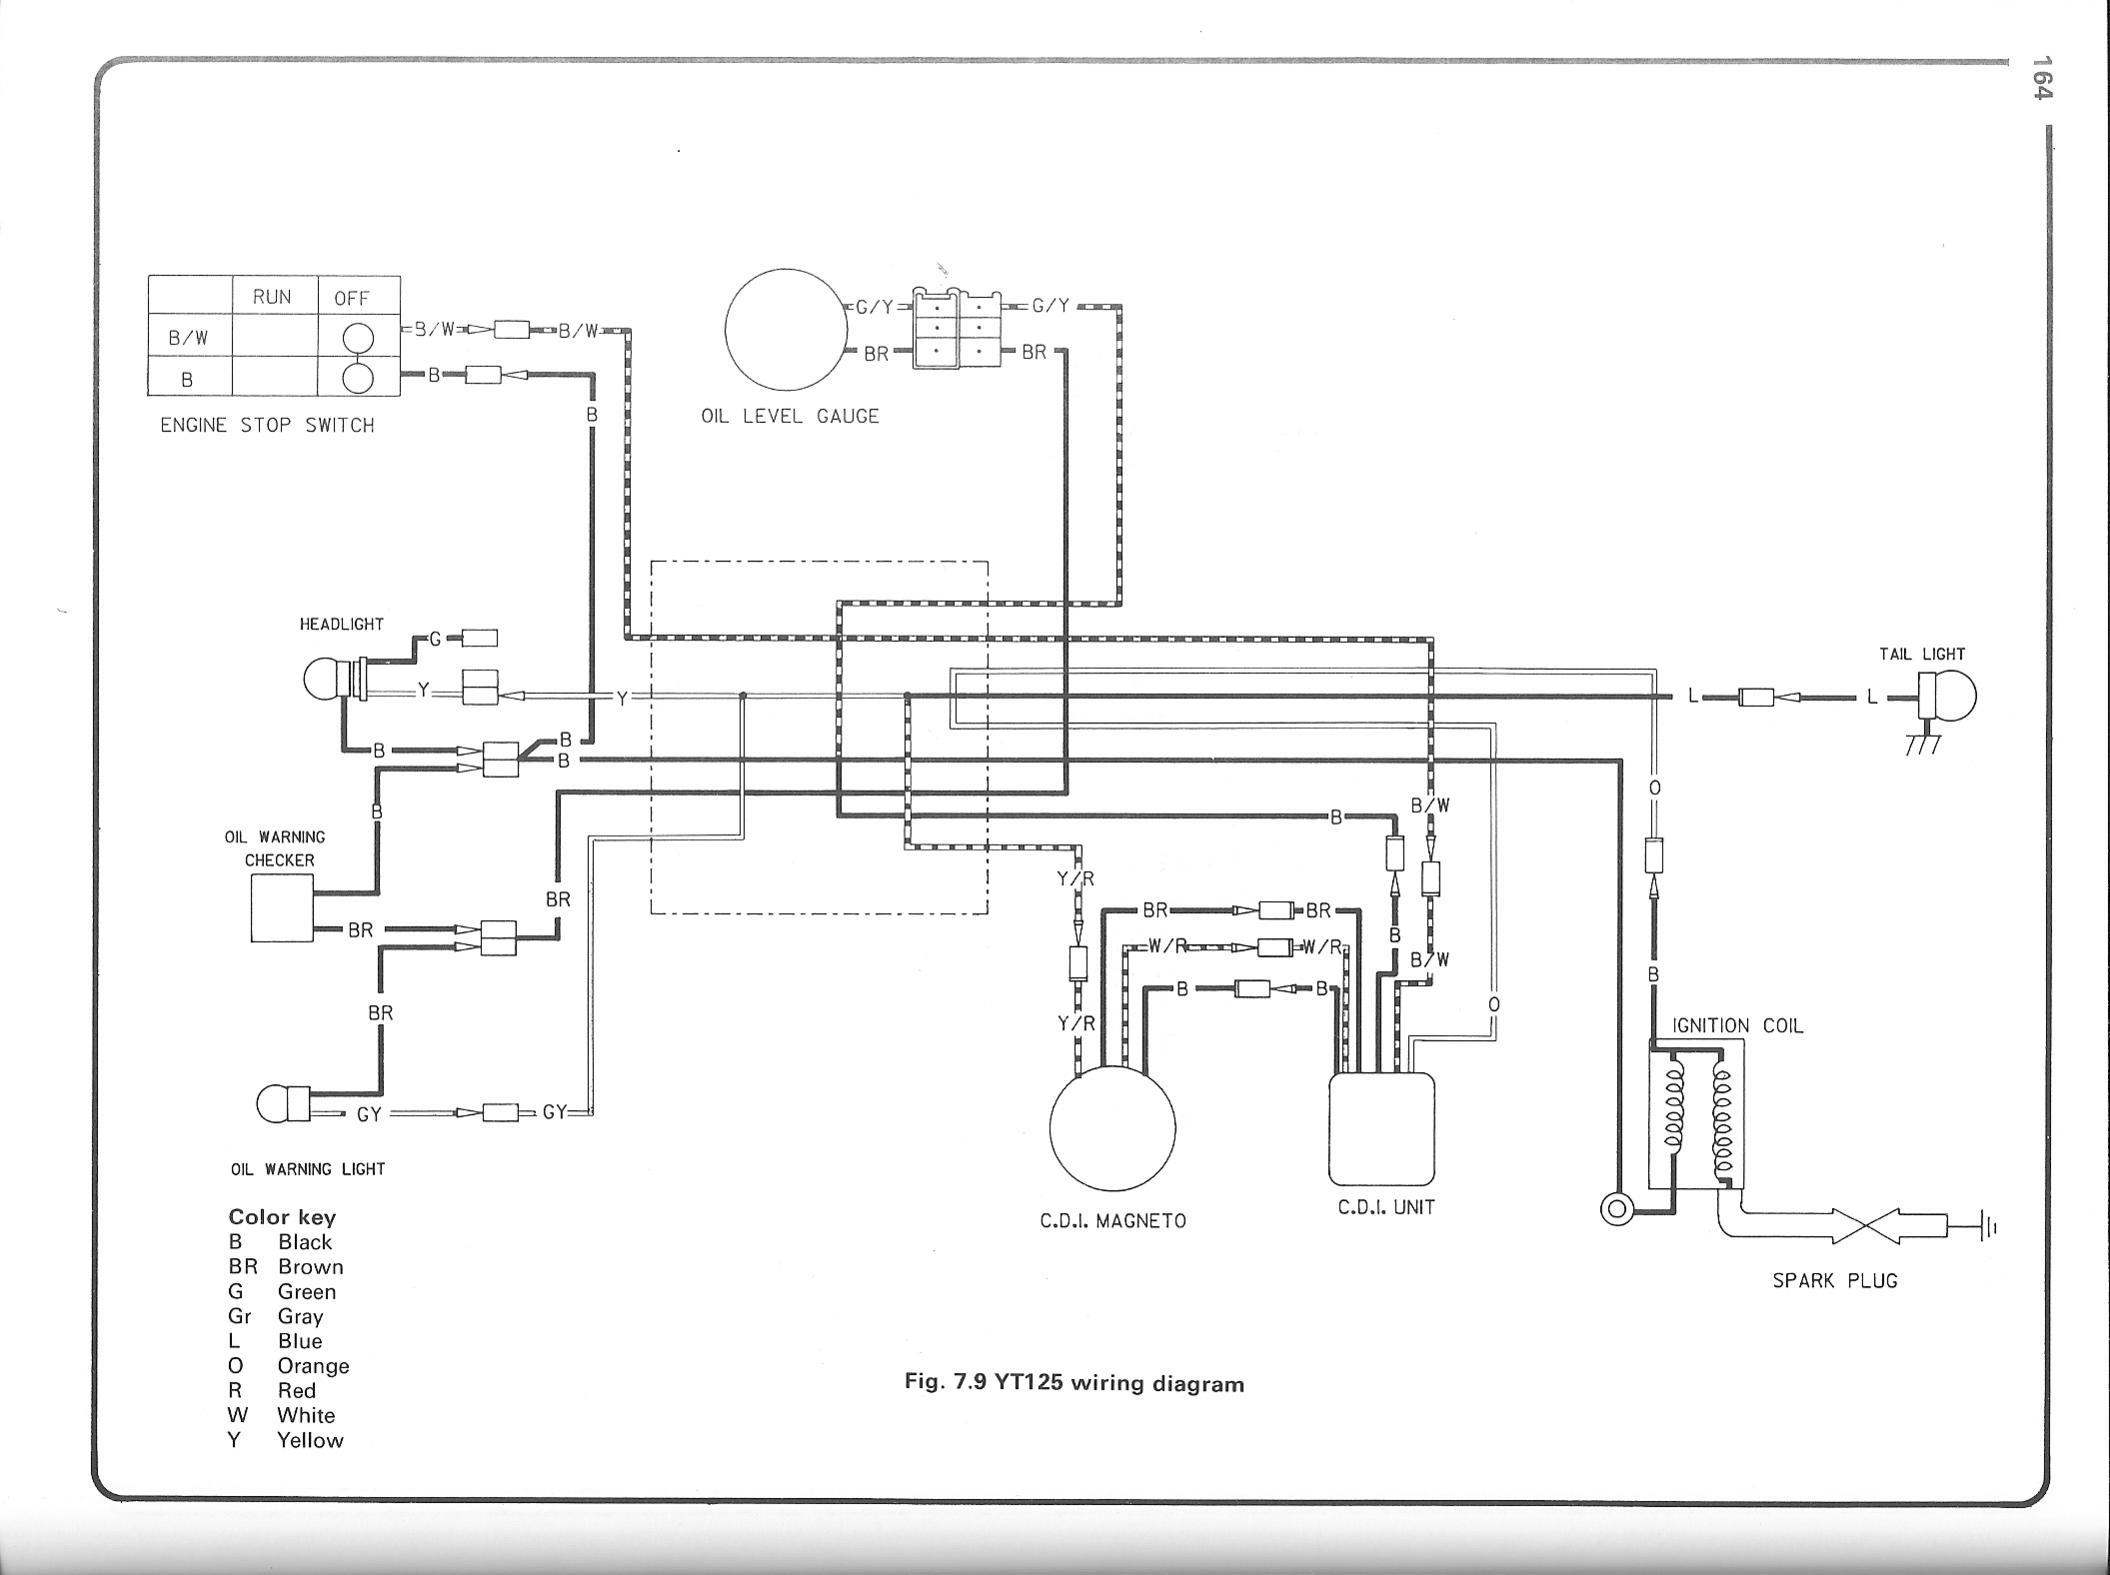 Wonderful yamaha moto 4 80 wiring diagram photos electrical great yamaha moto 4 80 wiring diagram contemporary electrical sciox Choice Image